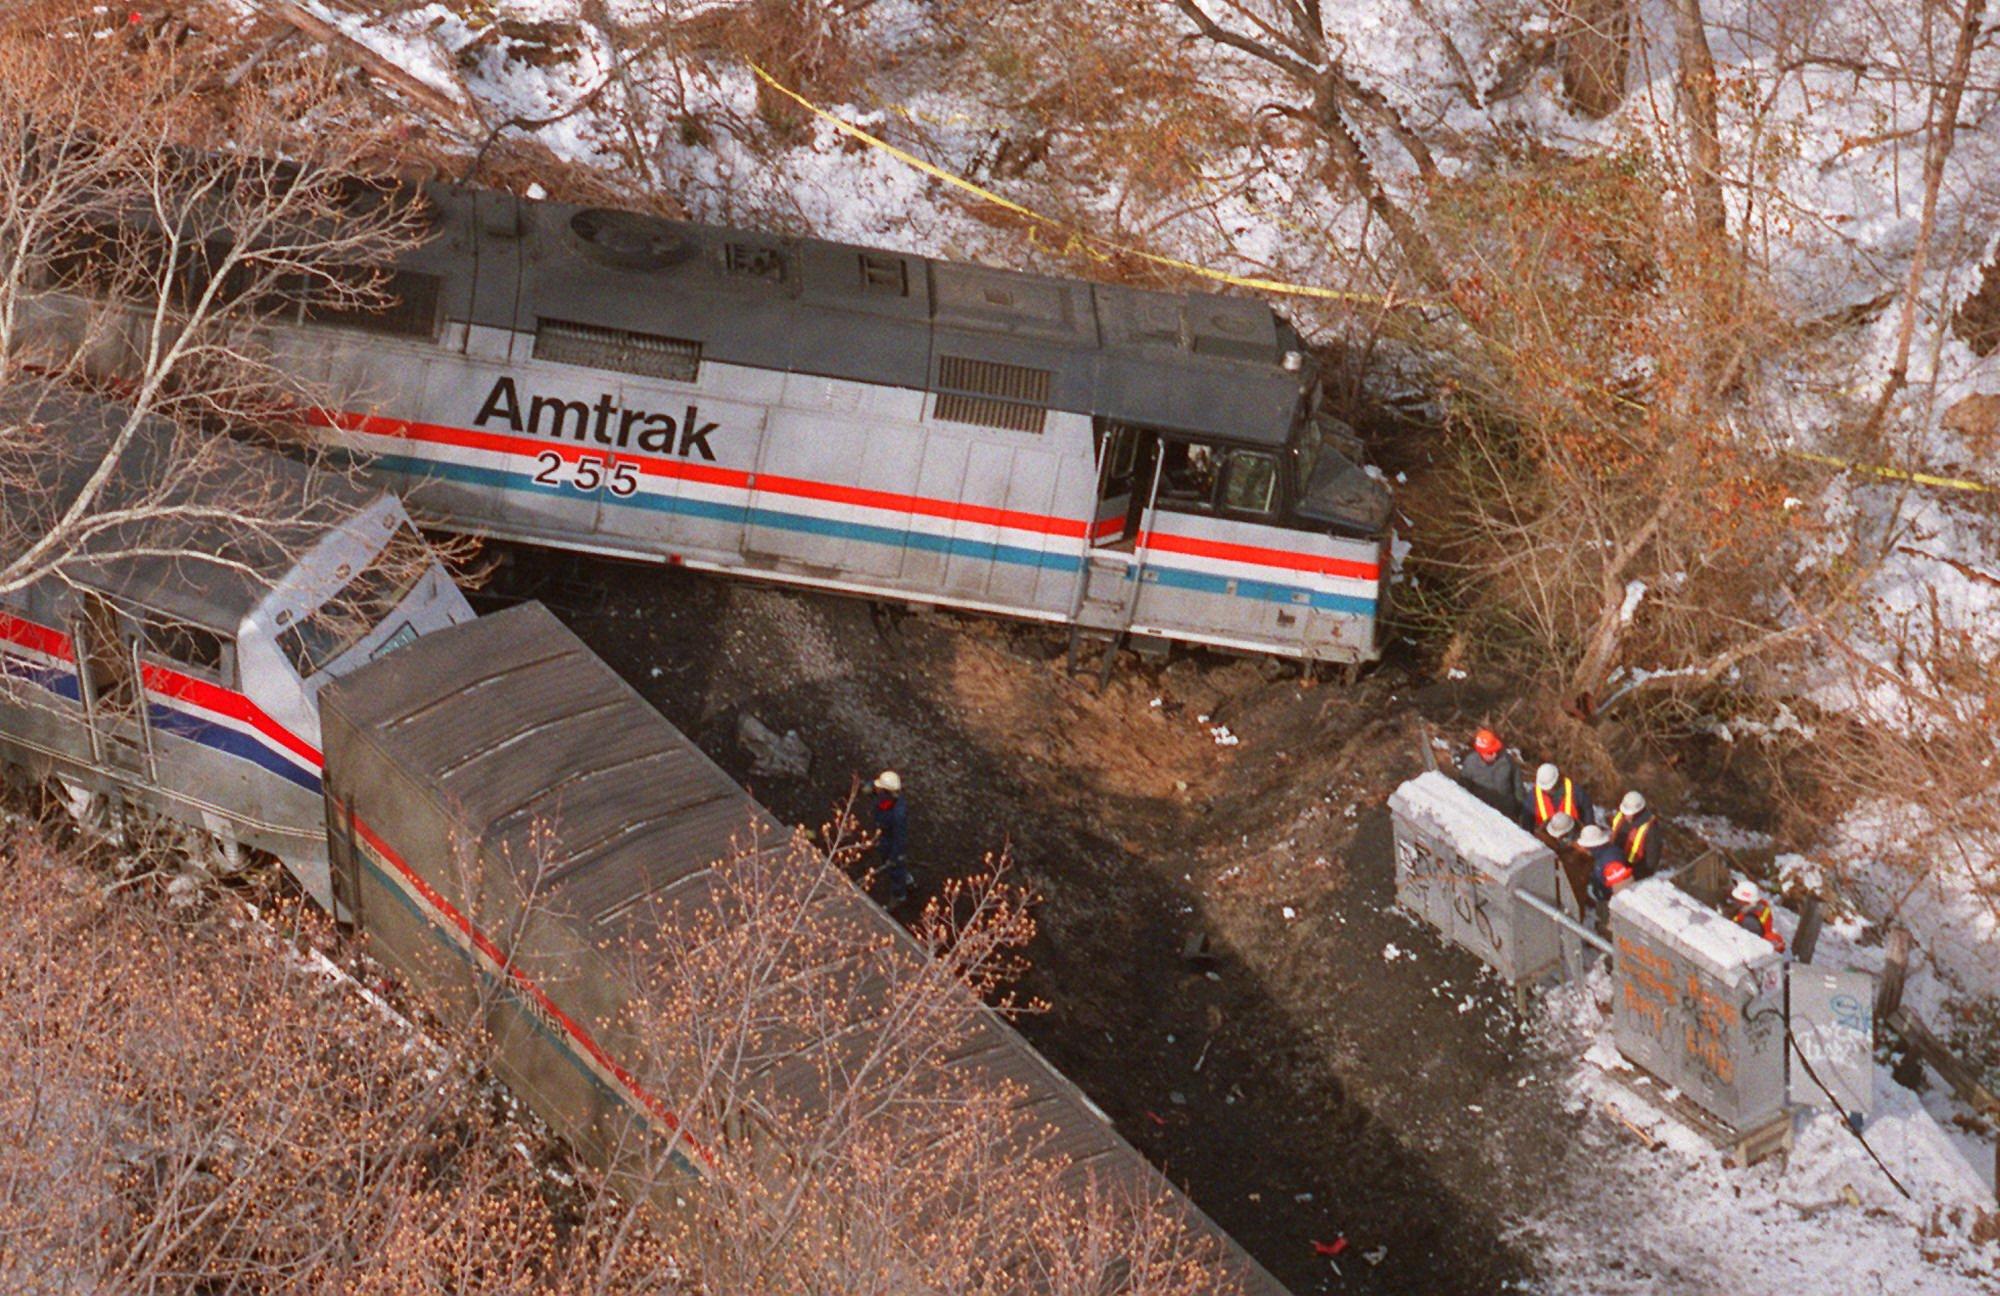 Retired Md. firefighters remember fatal Amtrak crash in ...